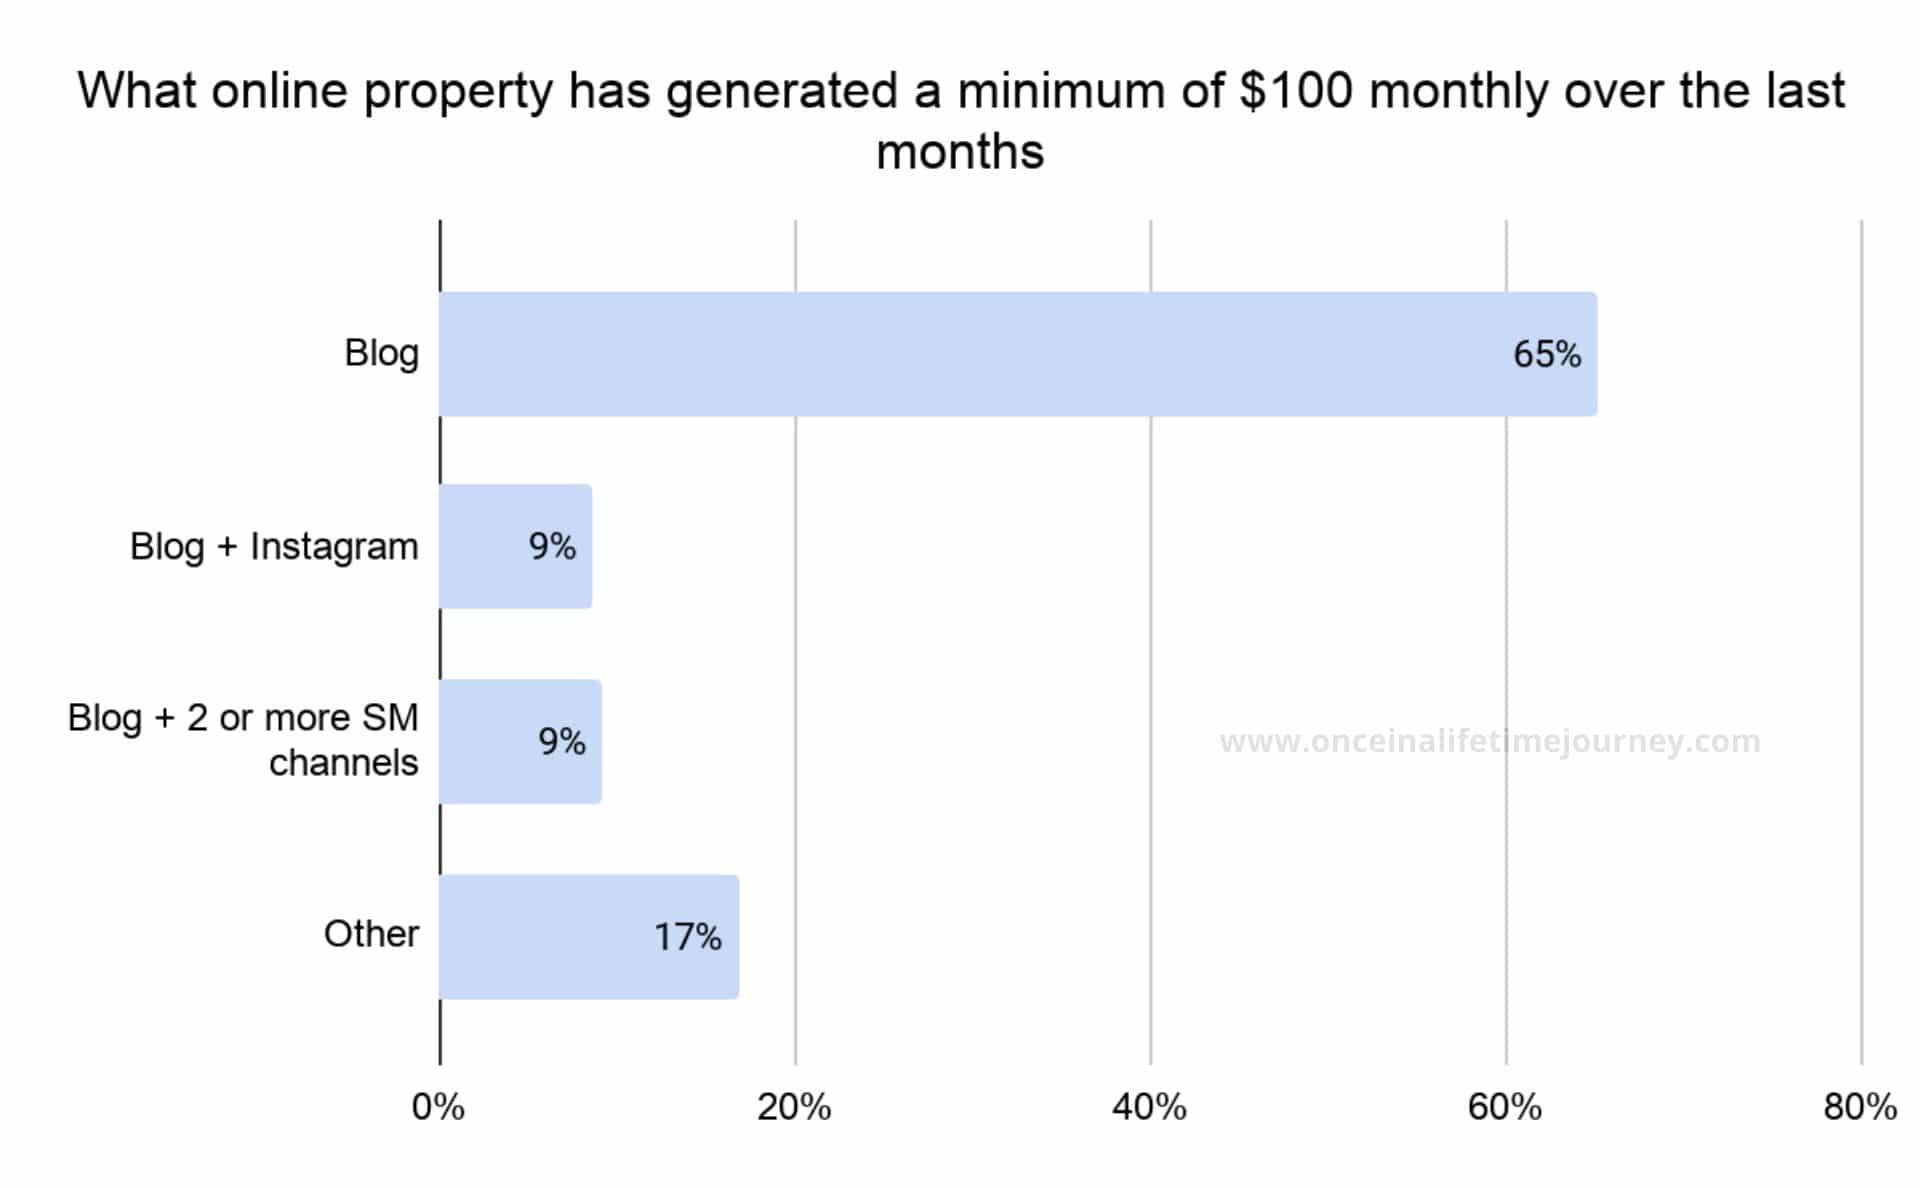 Online Properties generating a minimum of $100